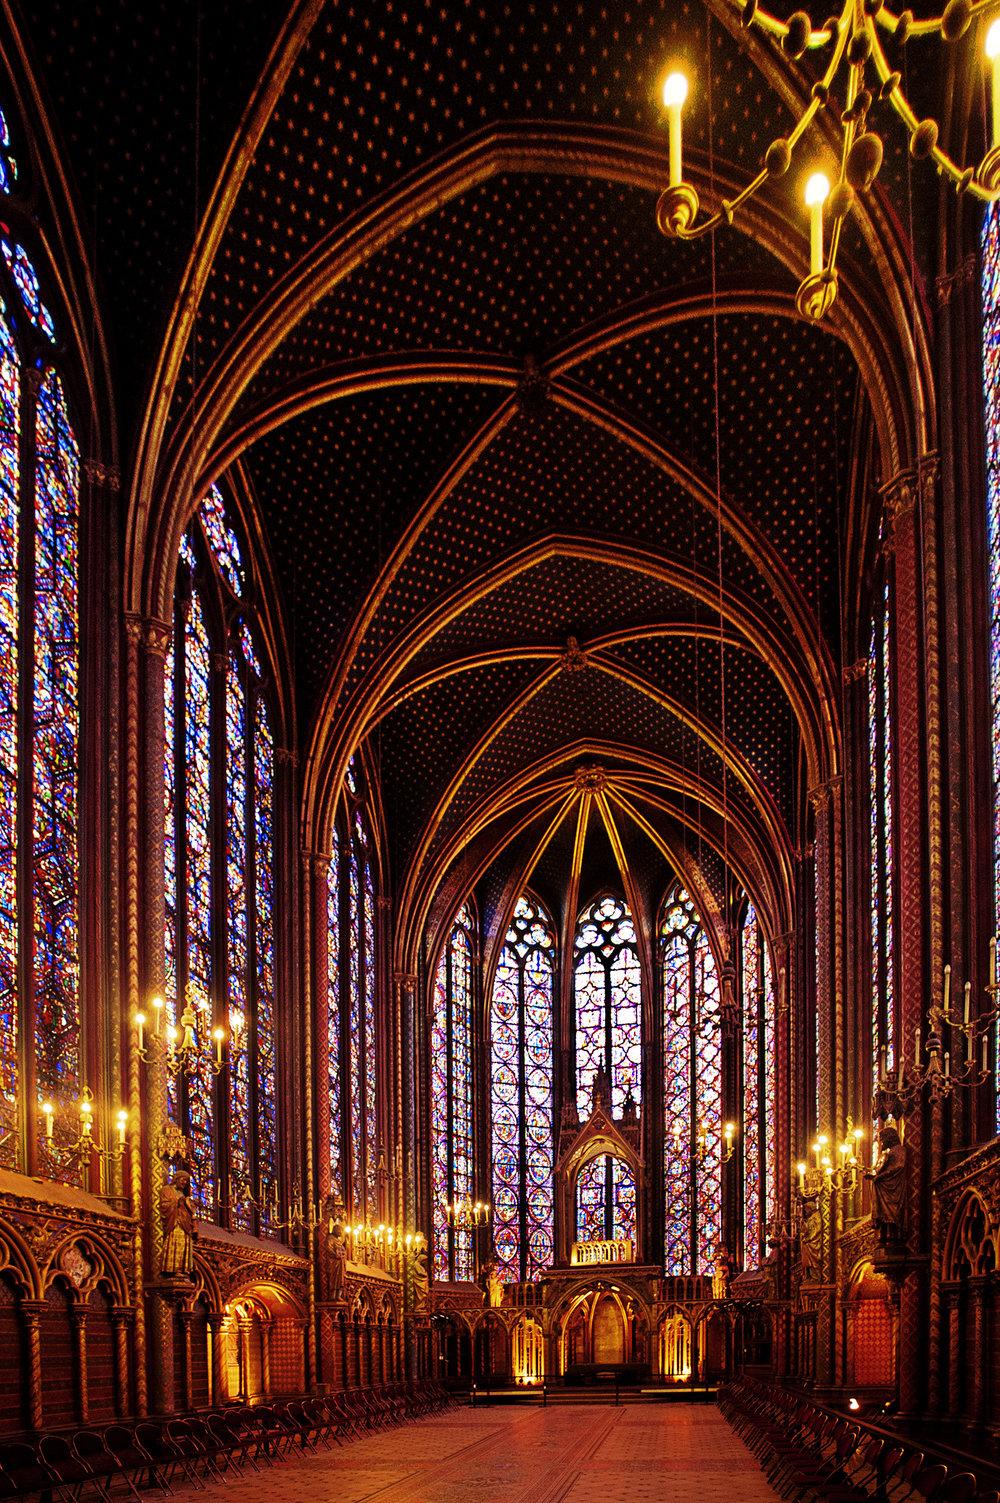 110925_ParisFrance_0780a.jpg